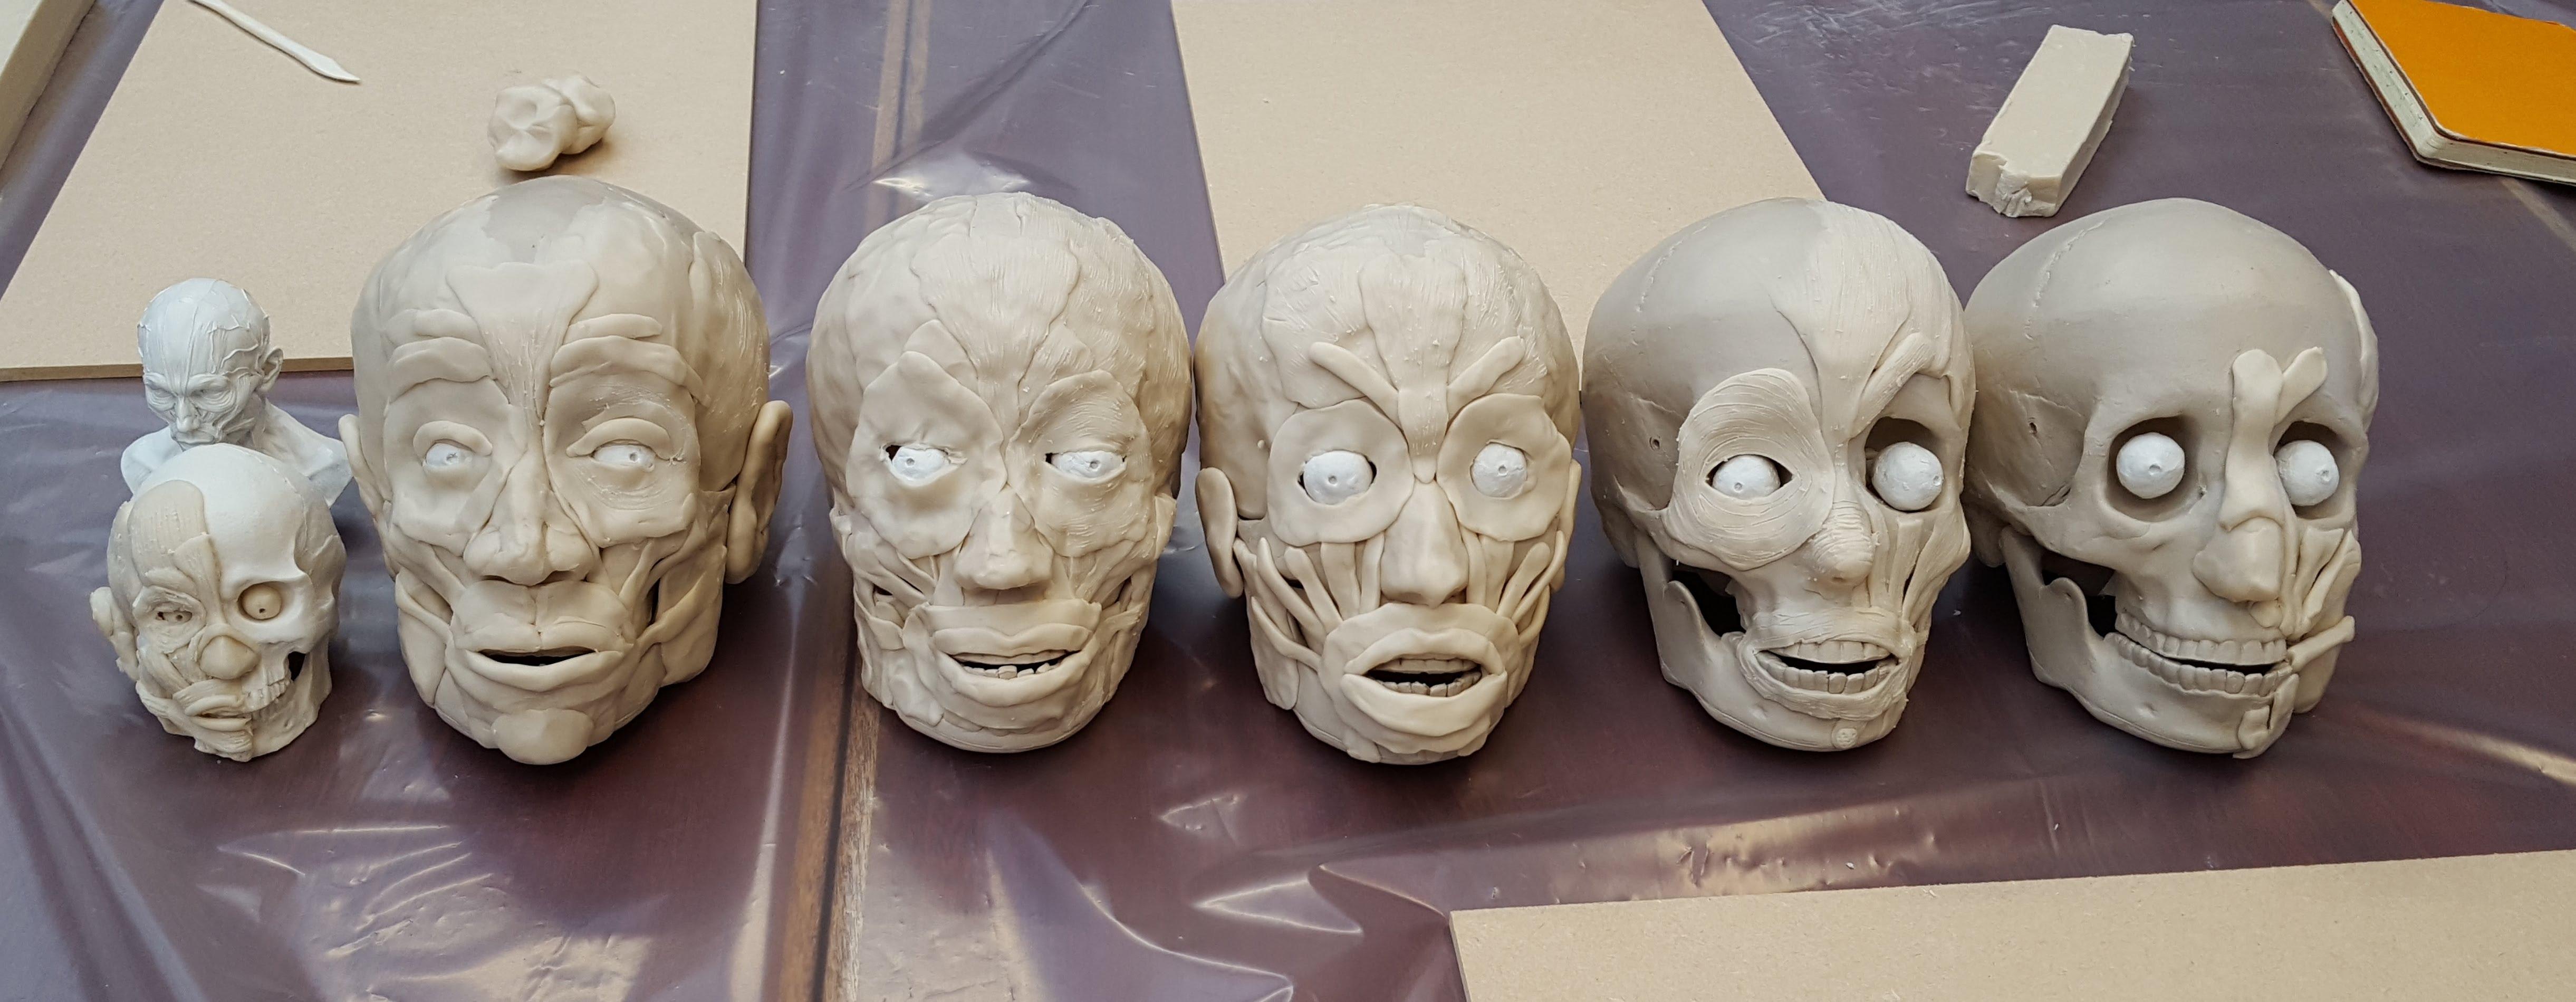 facial muscles workshop photo